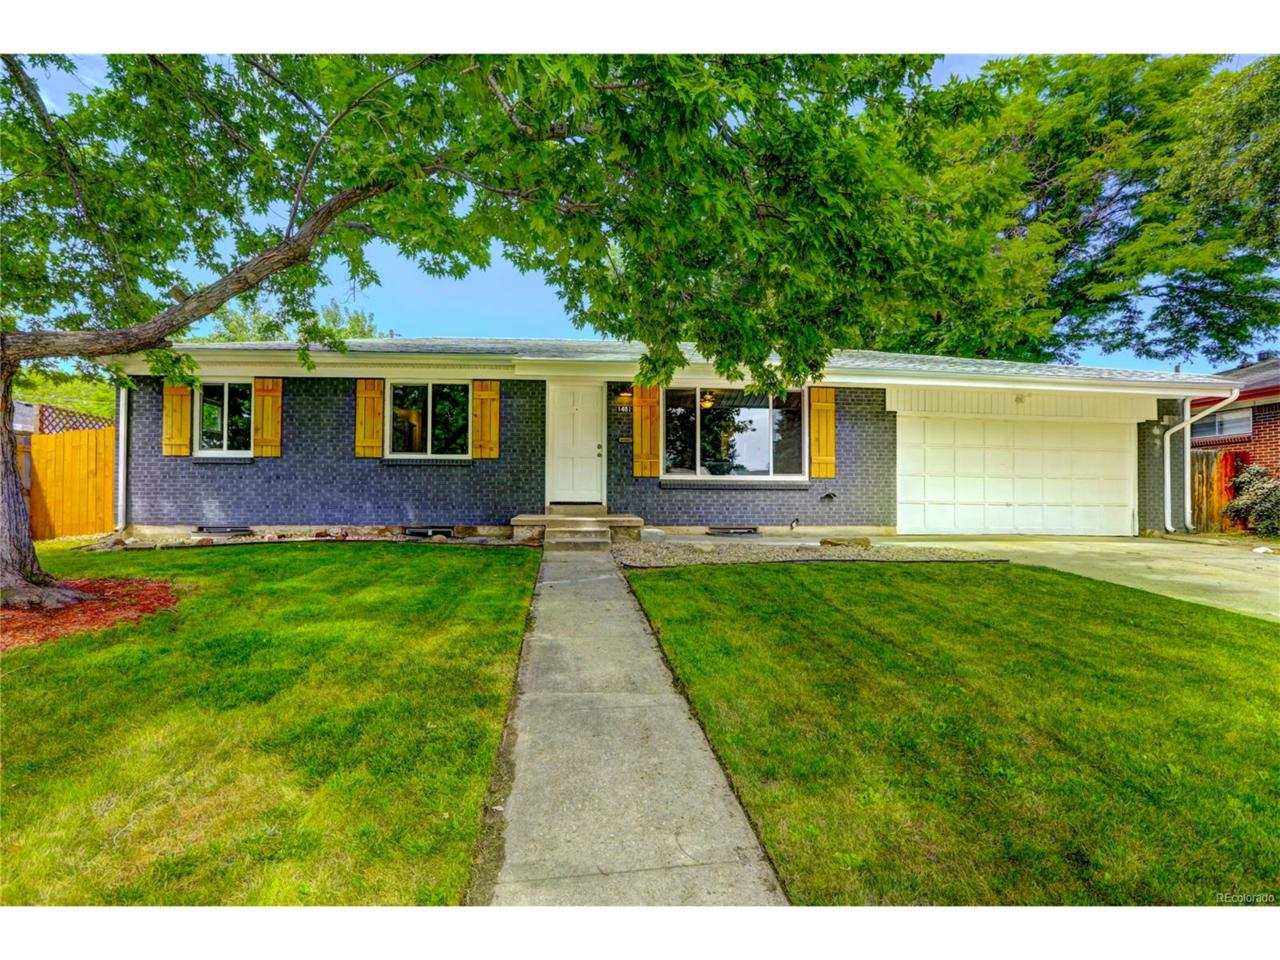 1481 S Ammons Street, Lakewood, CO 80232 (MLS #8338235) :: 8z Real Estate